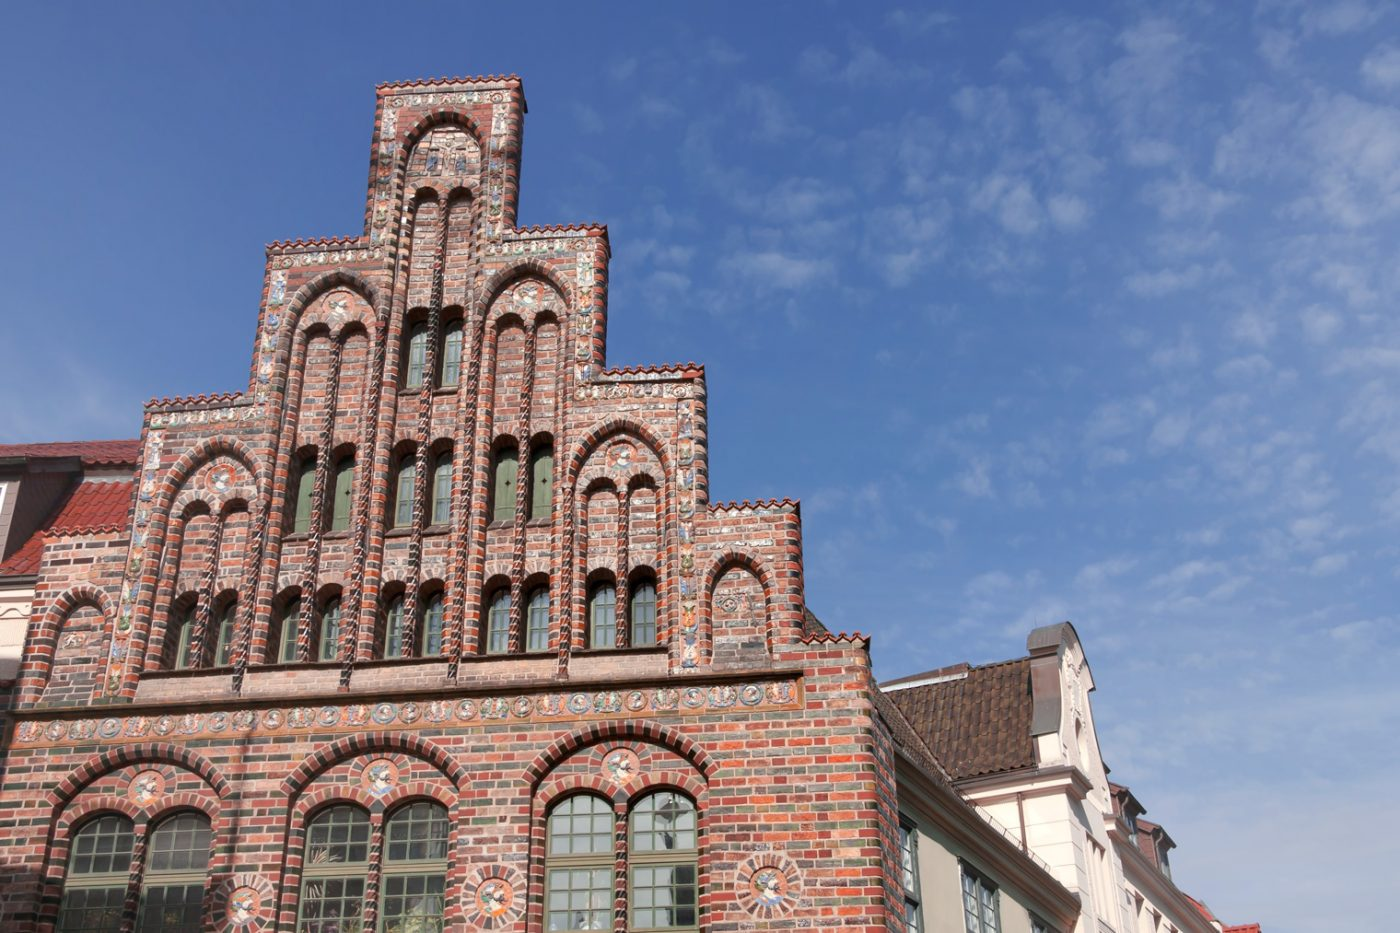 Der Giebel des Kerkhoffhauses in Rostock.